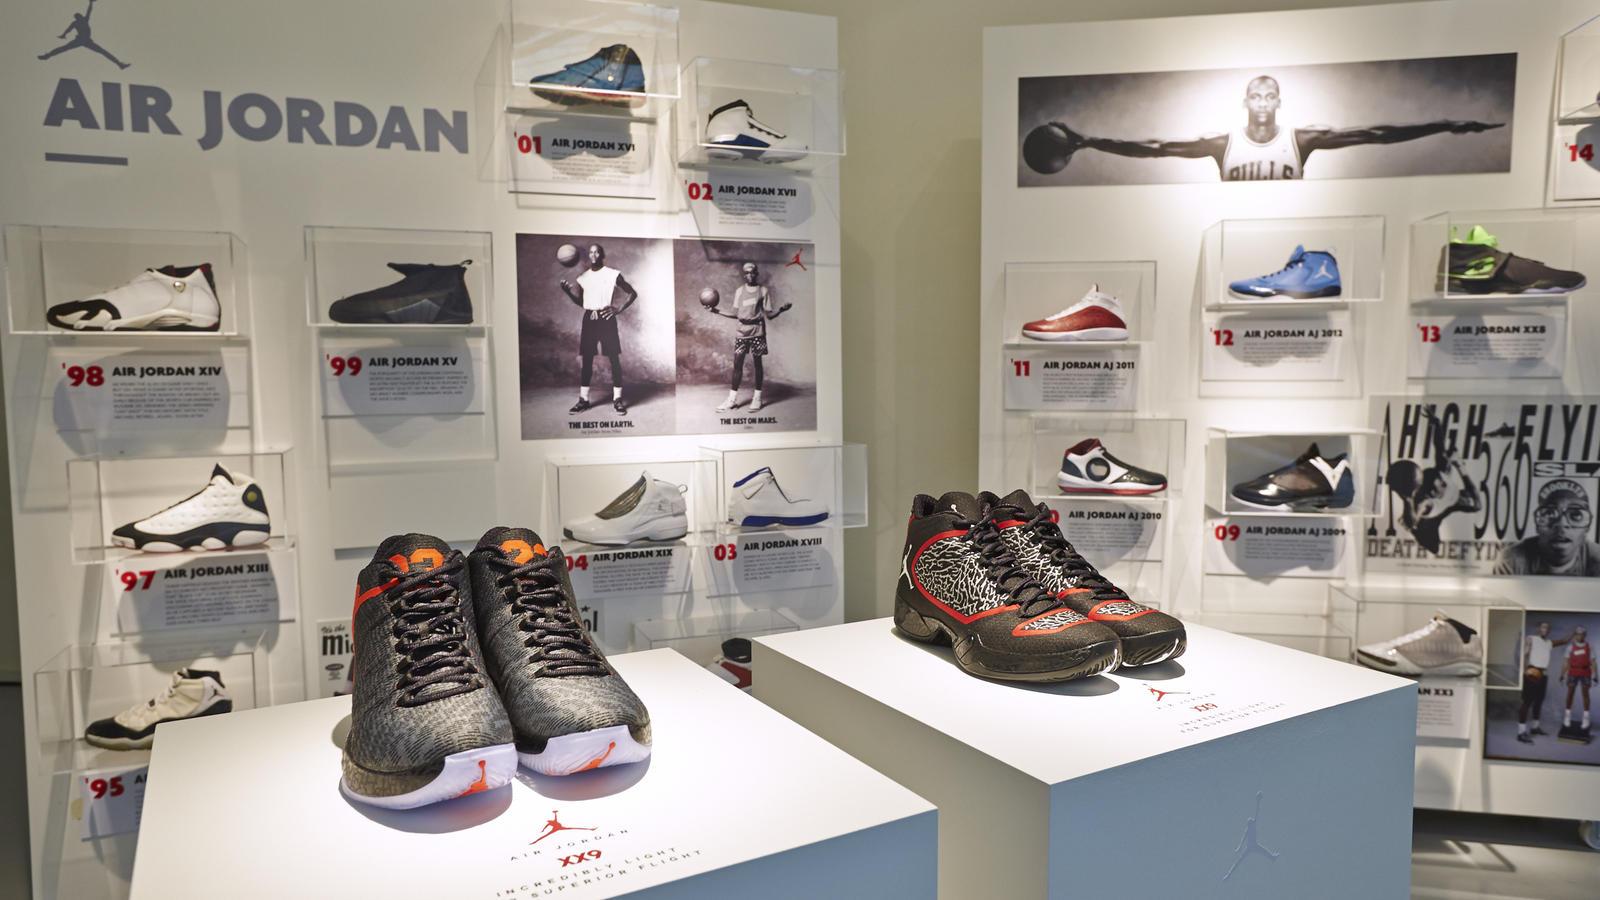 f0aa6143d WBF Nike Basketball Jordan Innovation Design Showcase 02.  WBF Nike Basketball Jordan Innovation Design Showcase 01